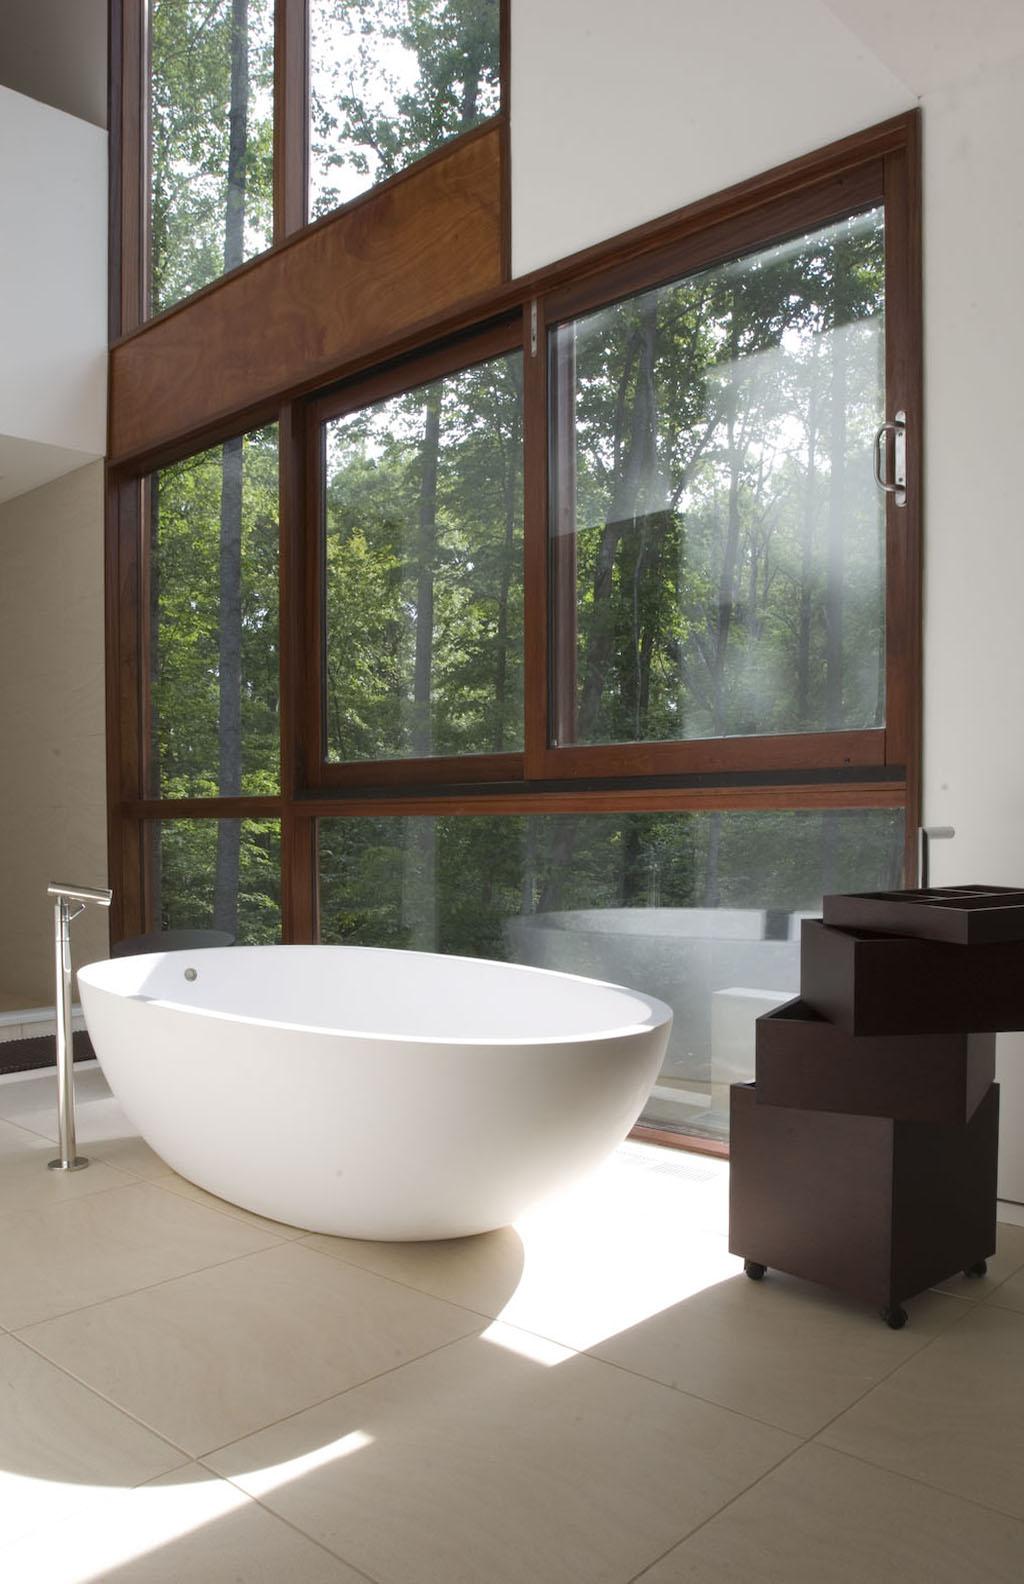 turkel_modern_design_prefab_home_redhill_hillsborough_bathroom.jpg